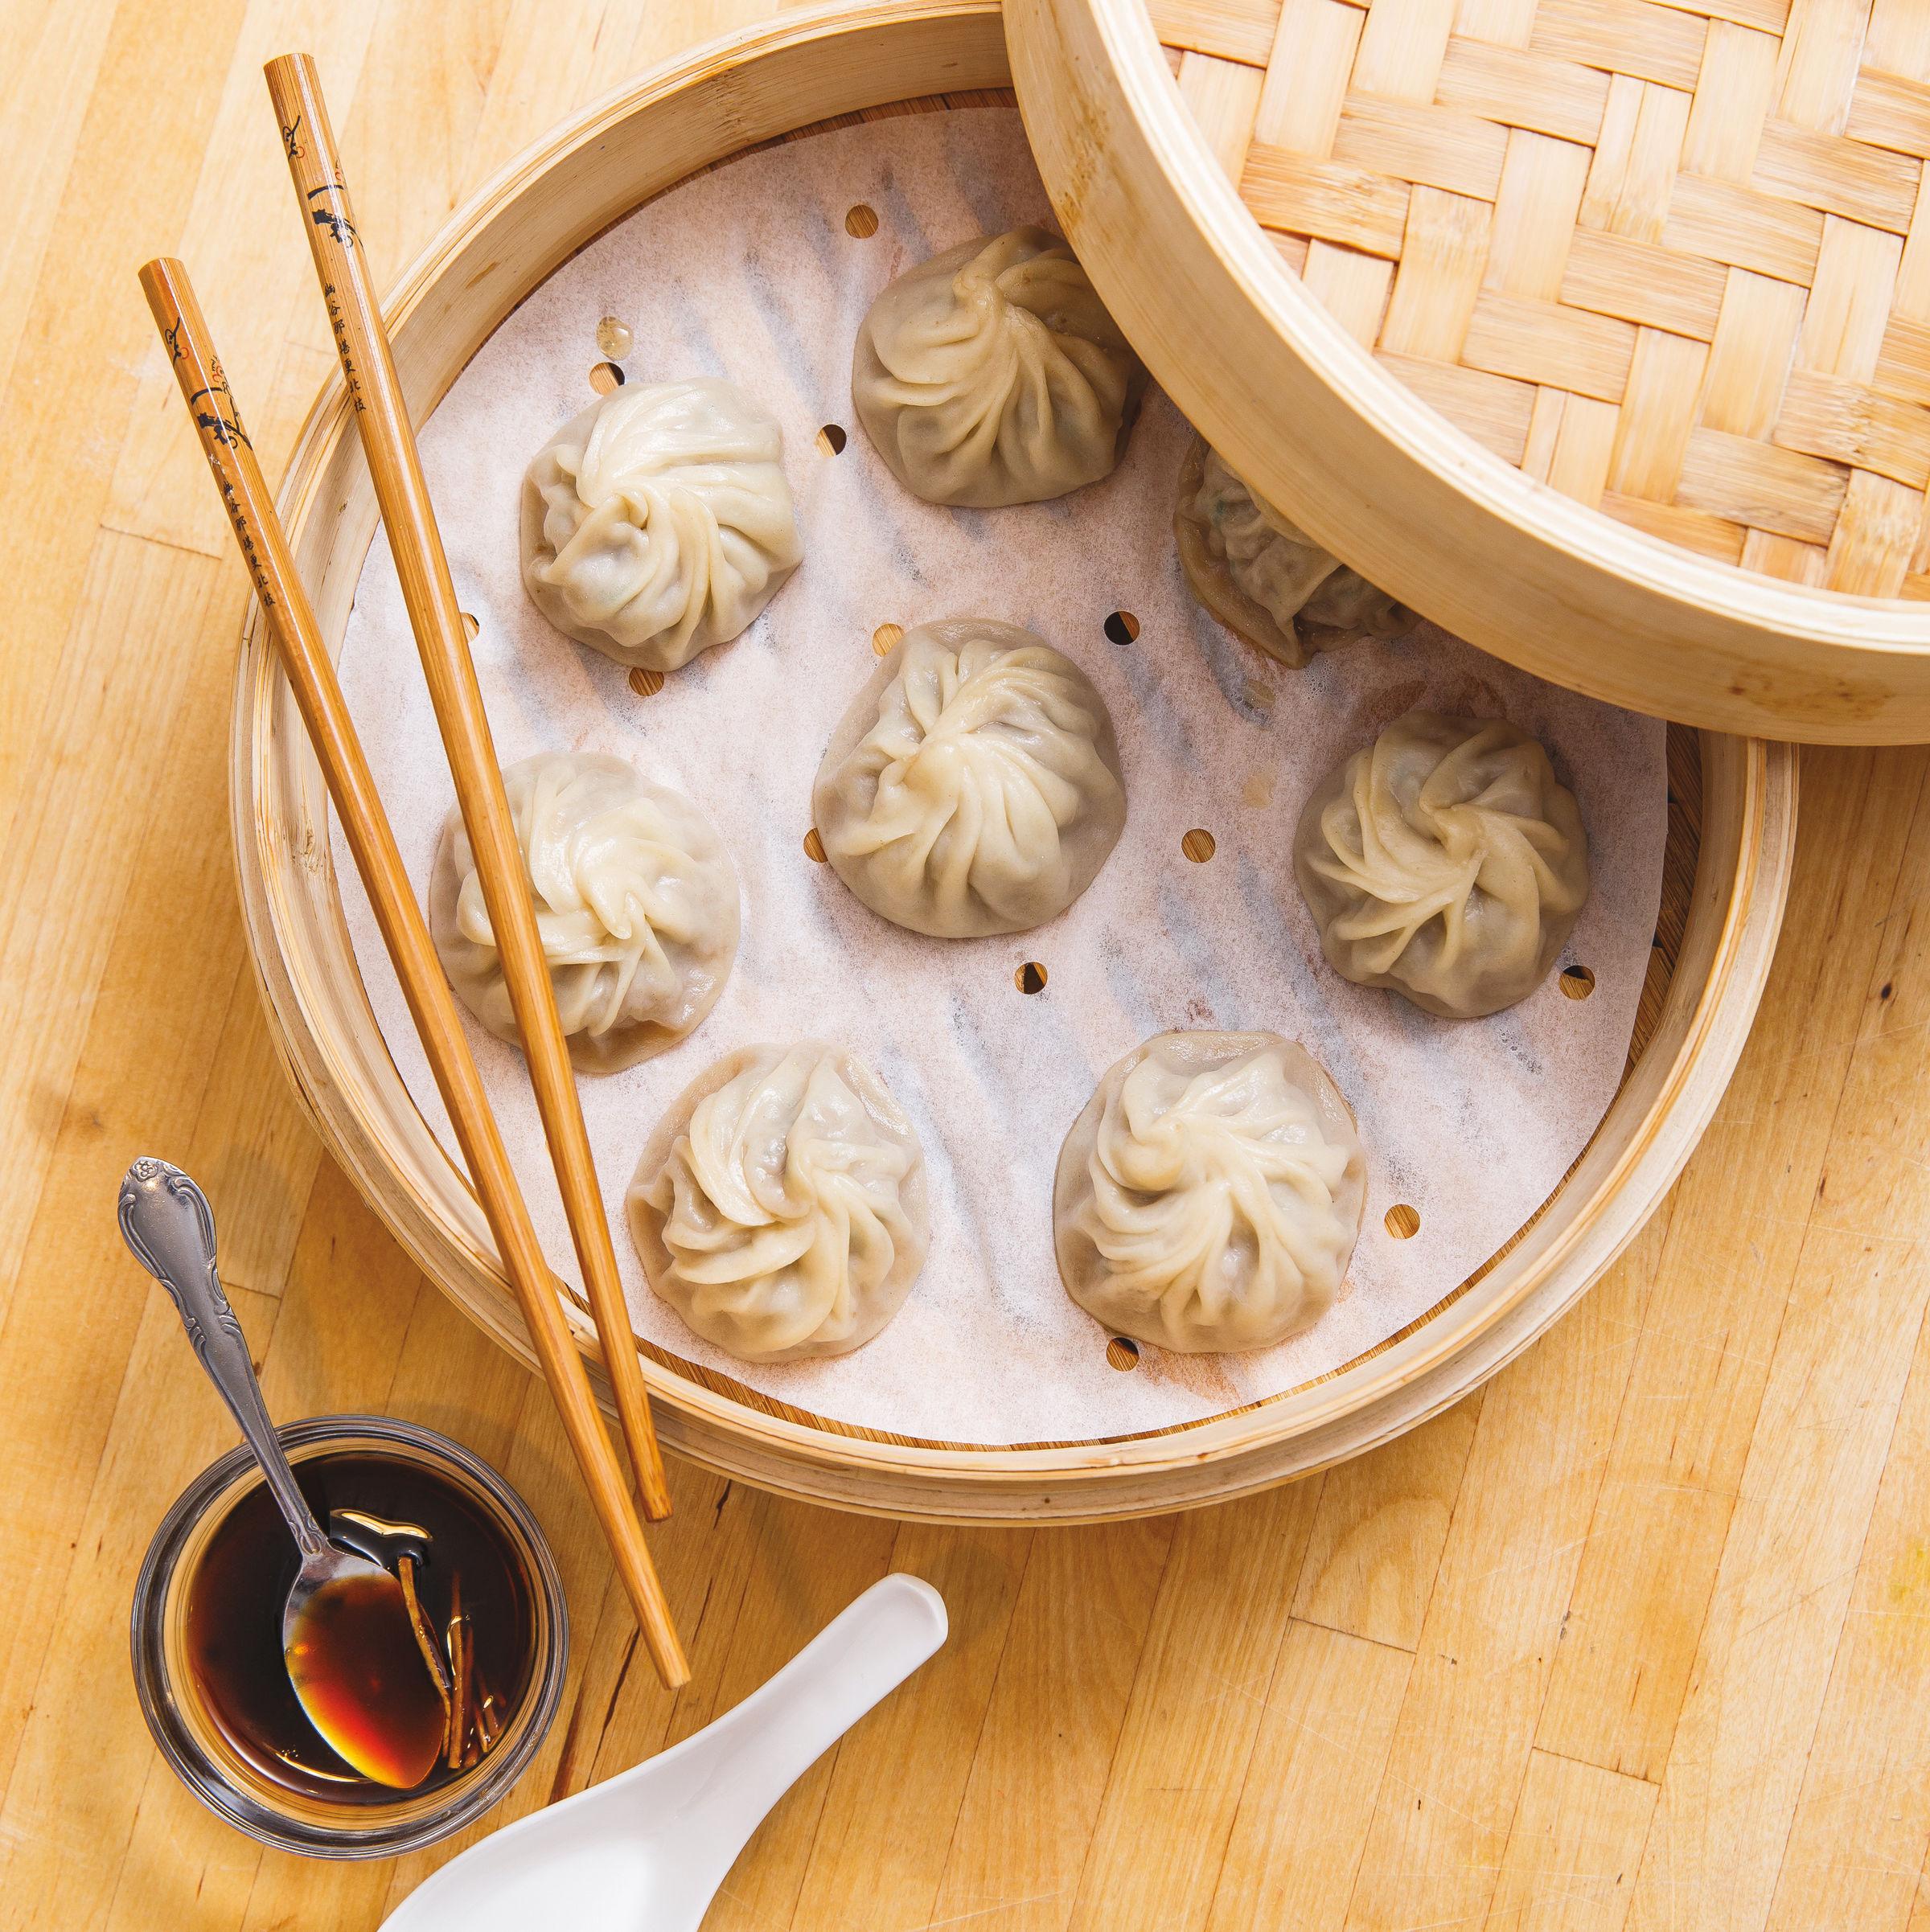 Pomo 0217 dumplings jasper shen xlb featured mddzjt